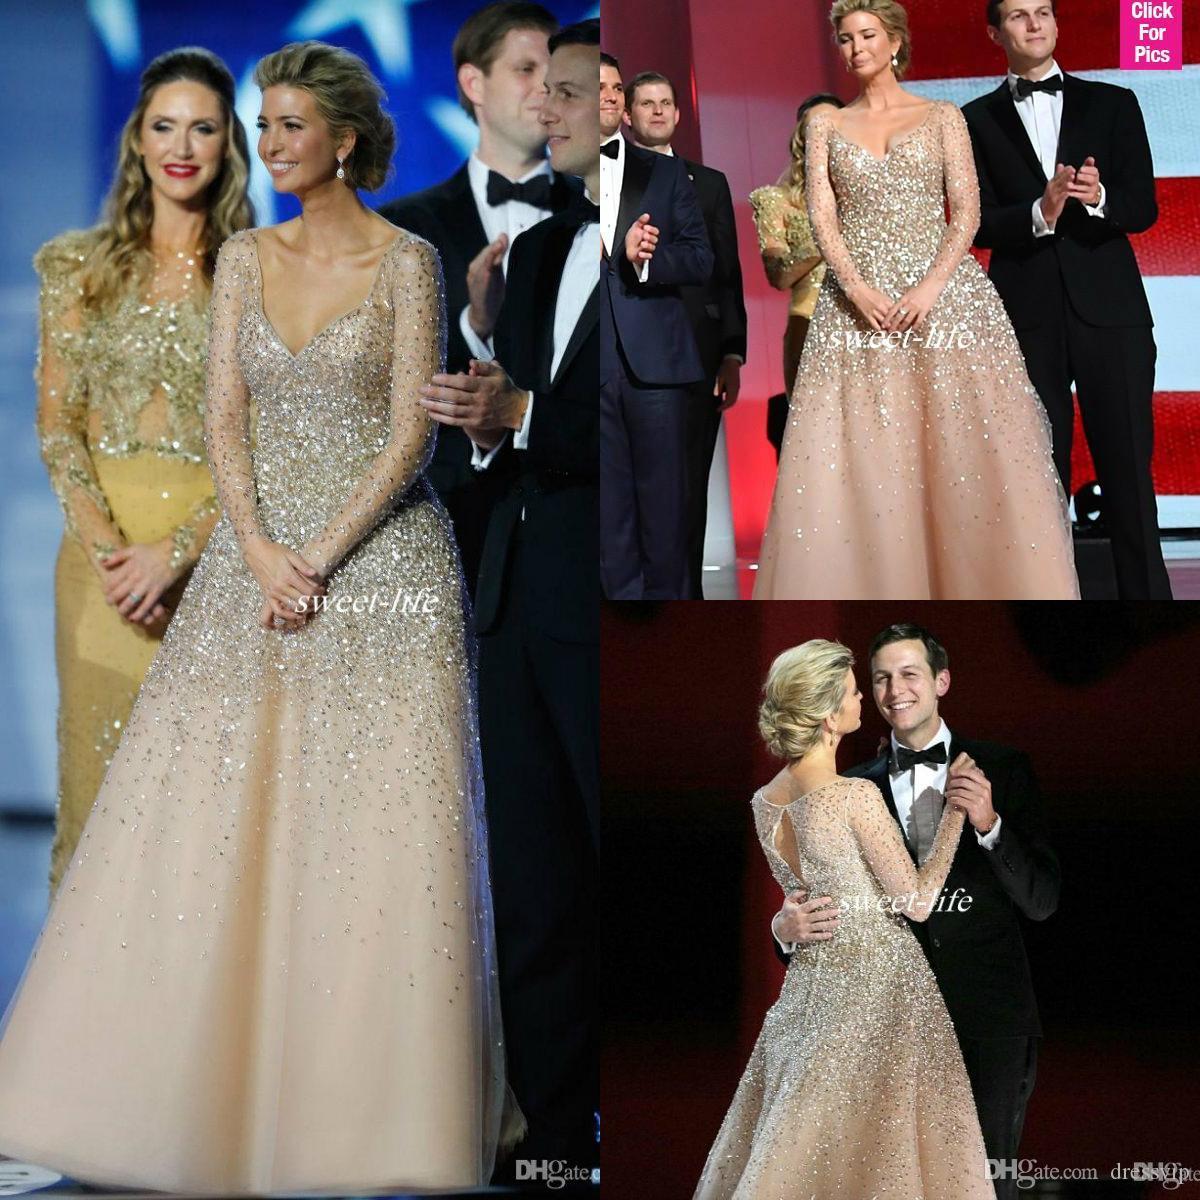 Ivanka Trump Celebrity Dresses 2018 새로운 샴페인 블링 블라인드 복장 볼 가운 Tulle 누드 패션 이브닝 가운